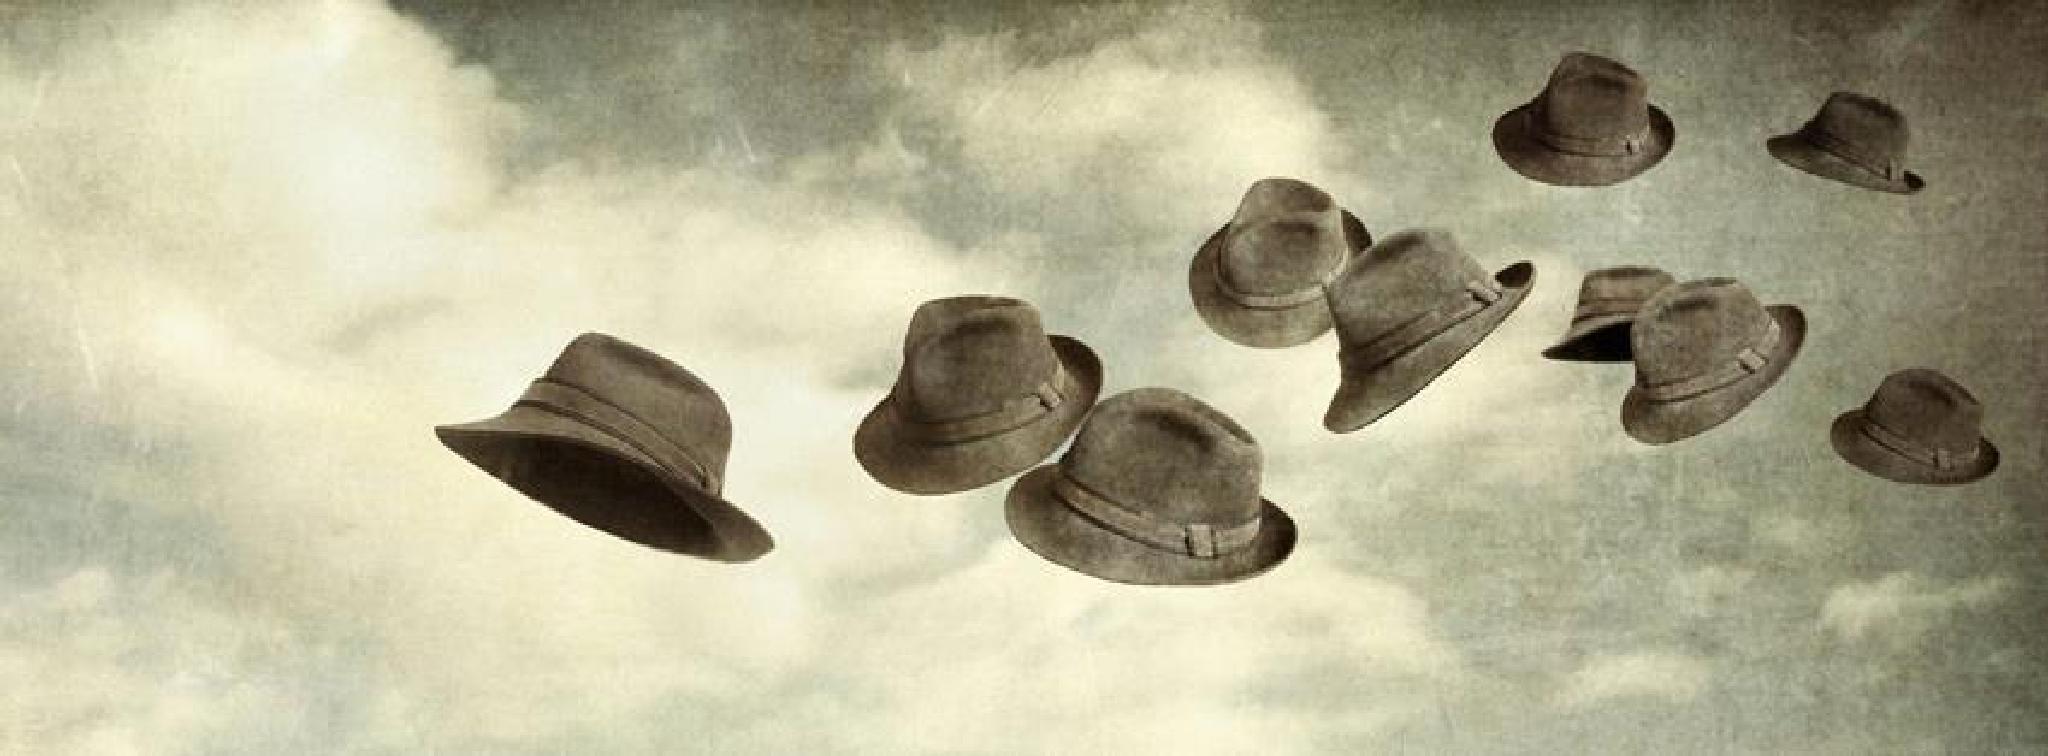 Untitled by Sarolta Bán